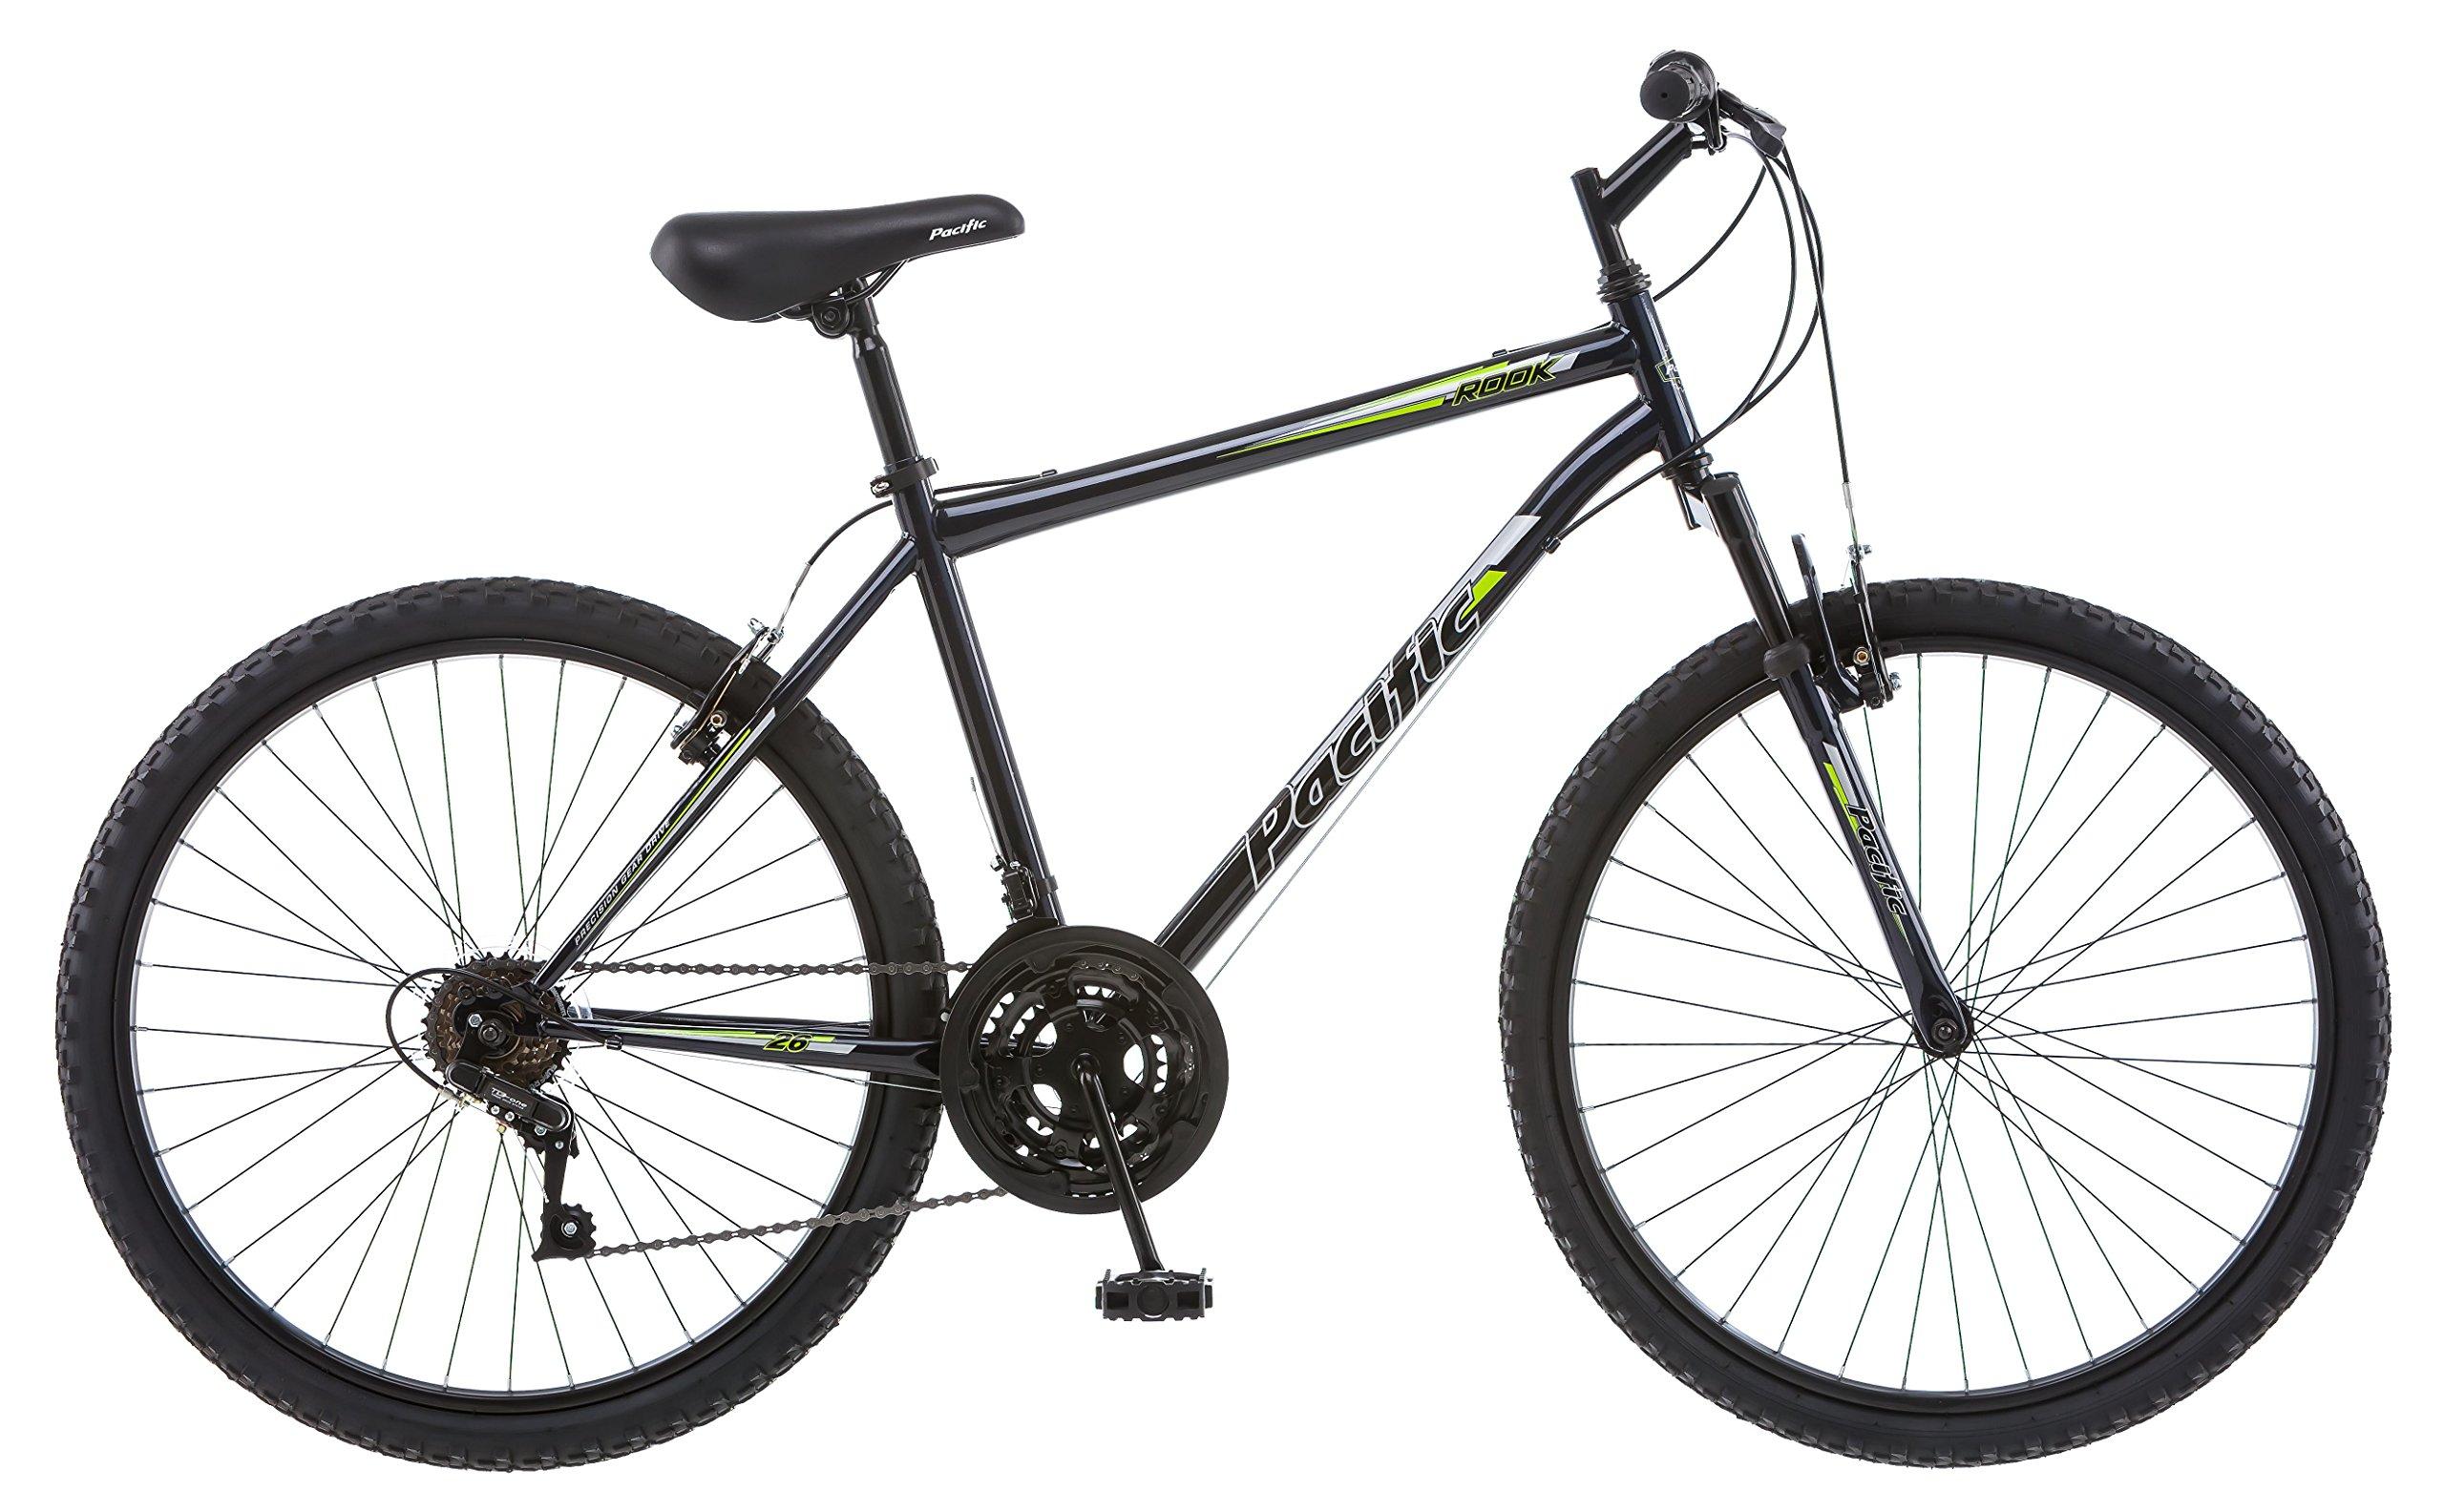 2020 Gravity Fsx 1 0 Dual Full Suspension Mountain Bike